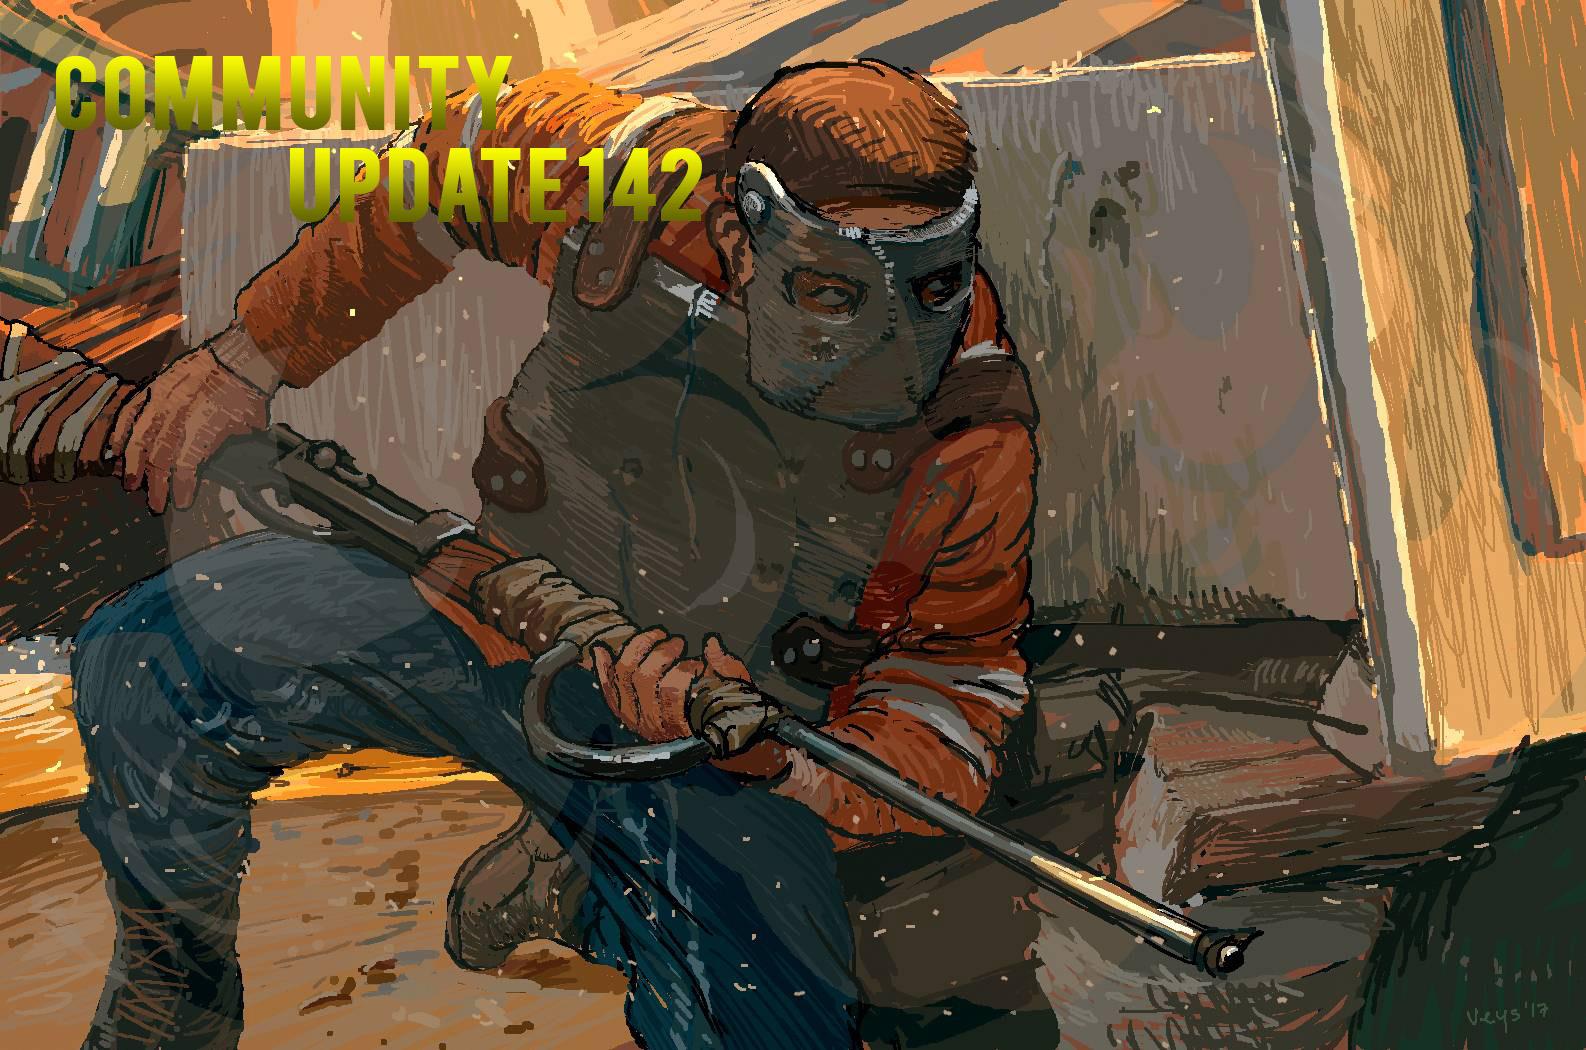 Community Update 142